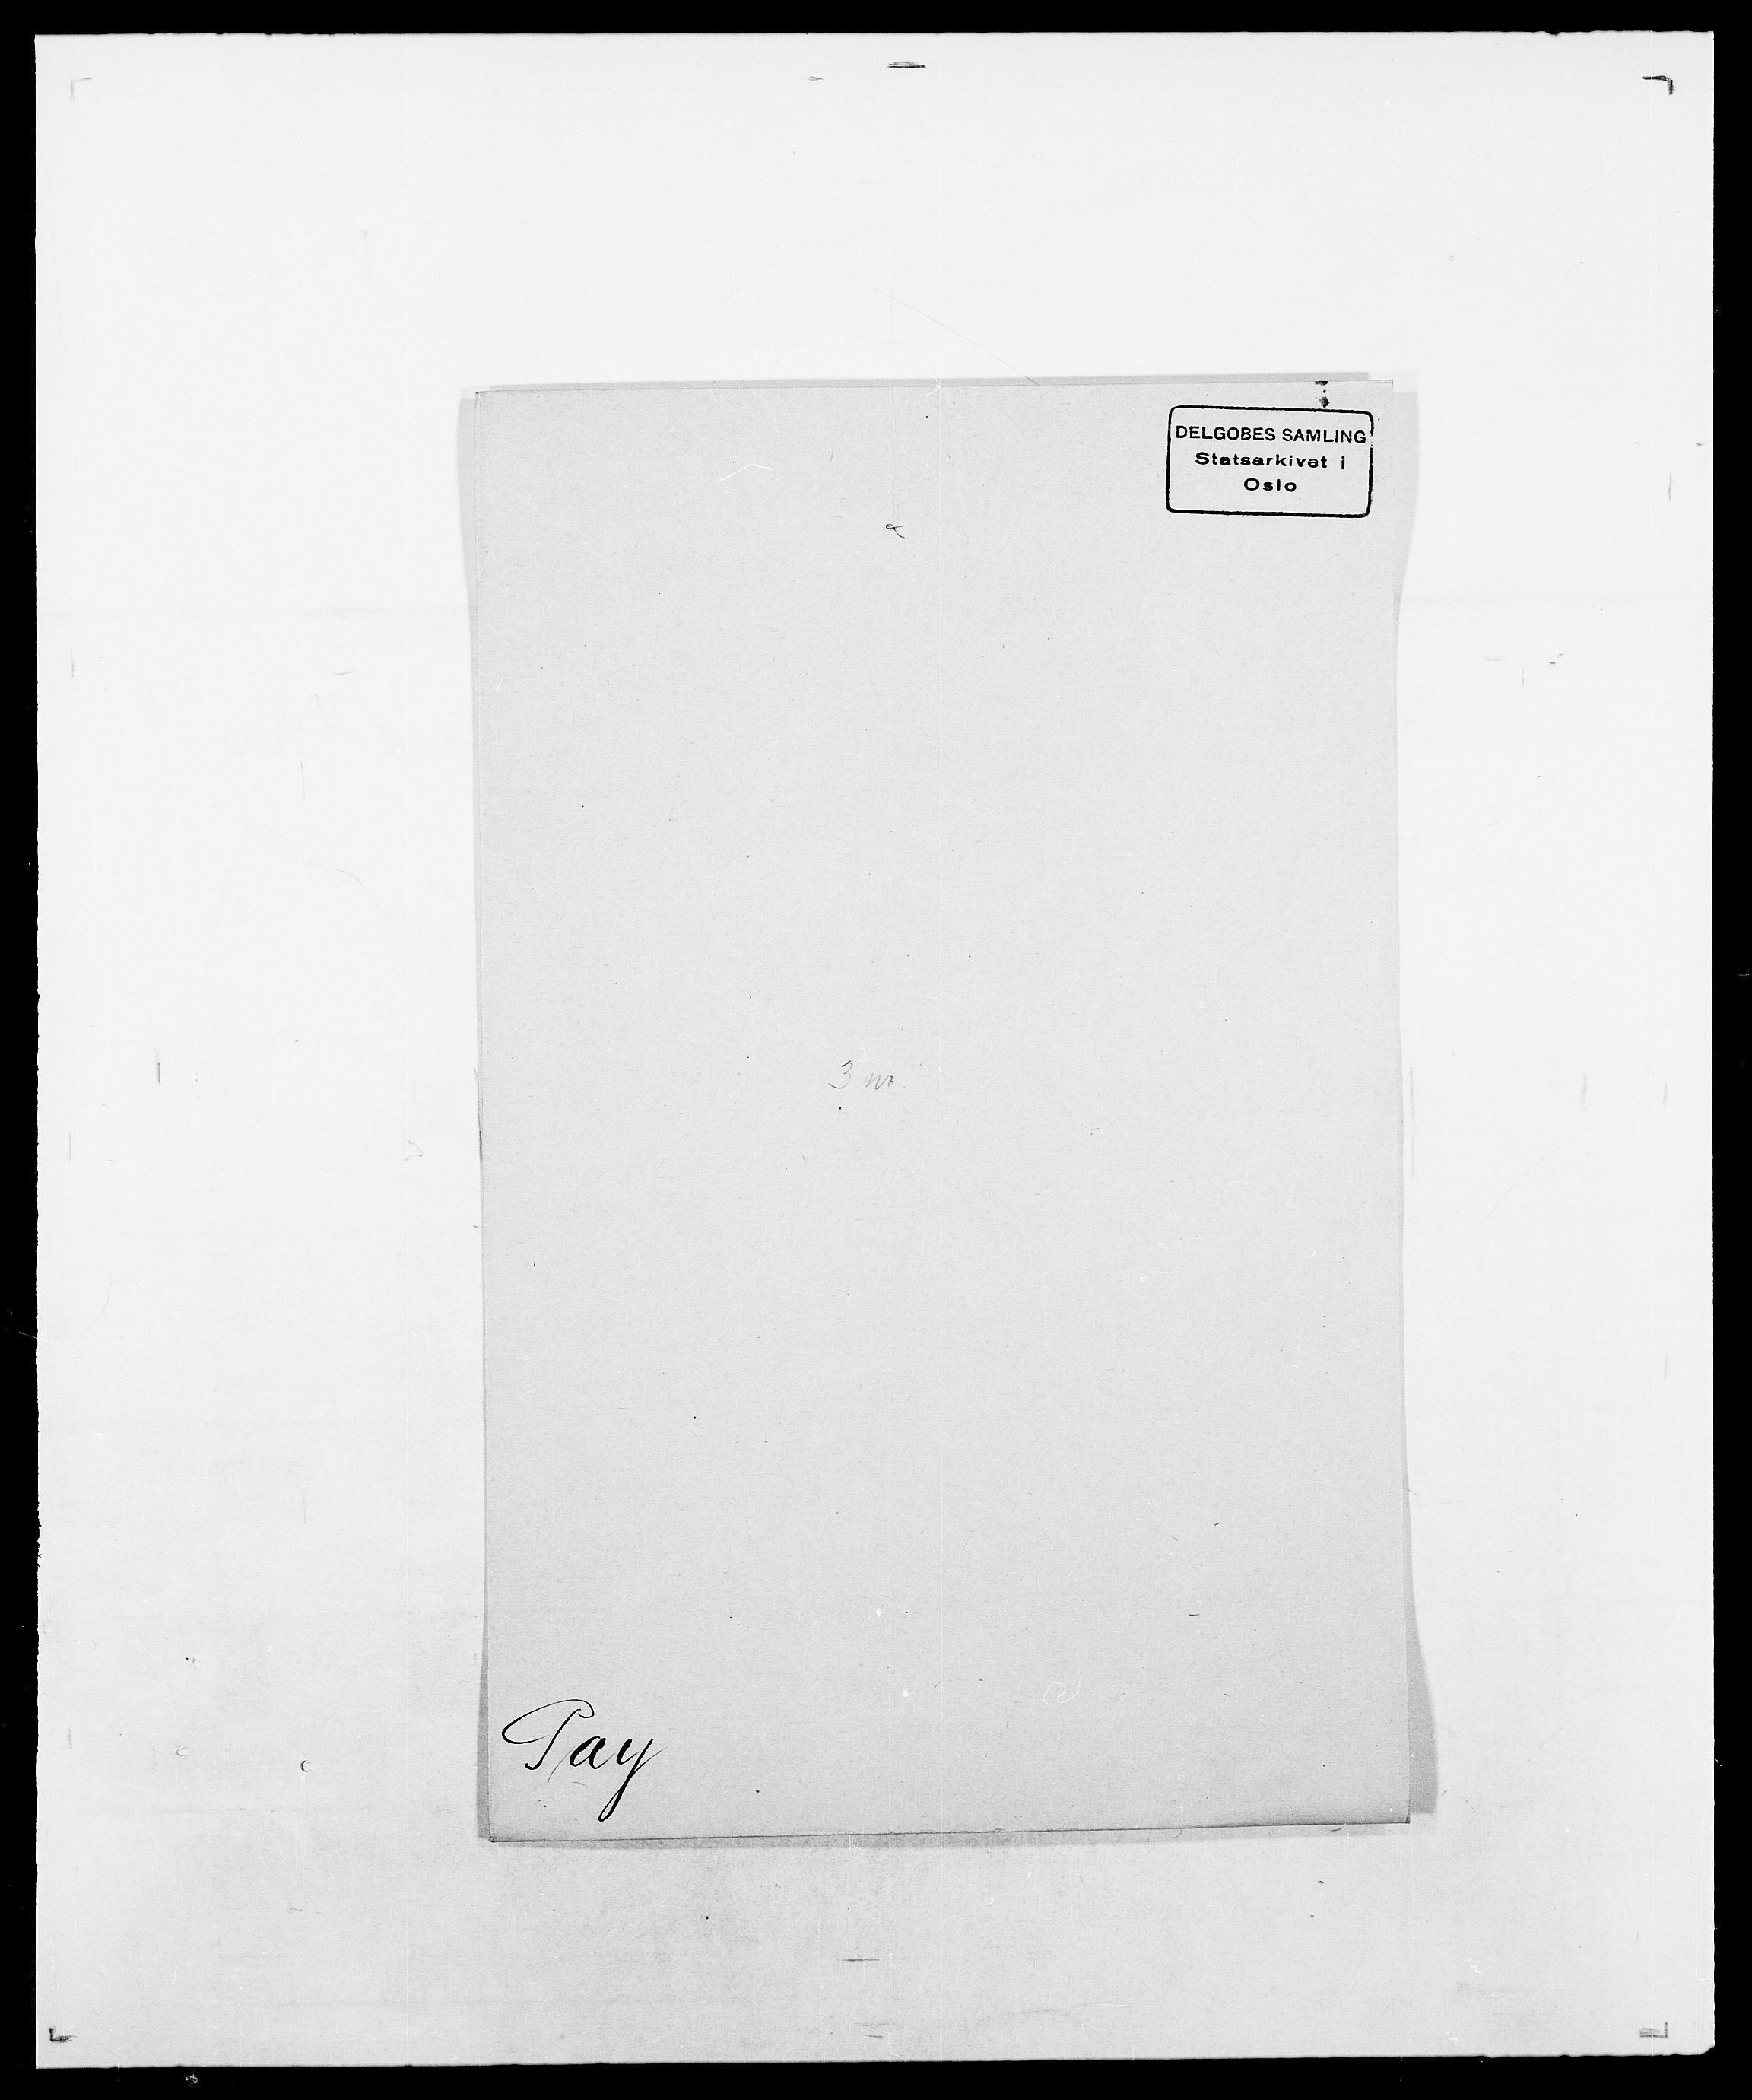 SAO, Delgobe, Charles Antoine - samling, D/Da/L0030: Paars - Pittelkov, s. 253